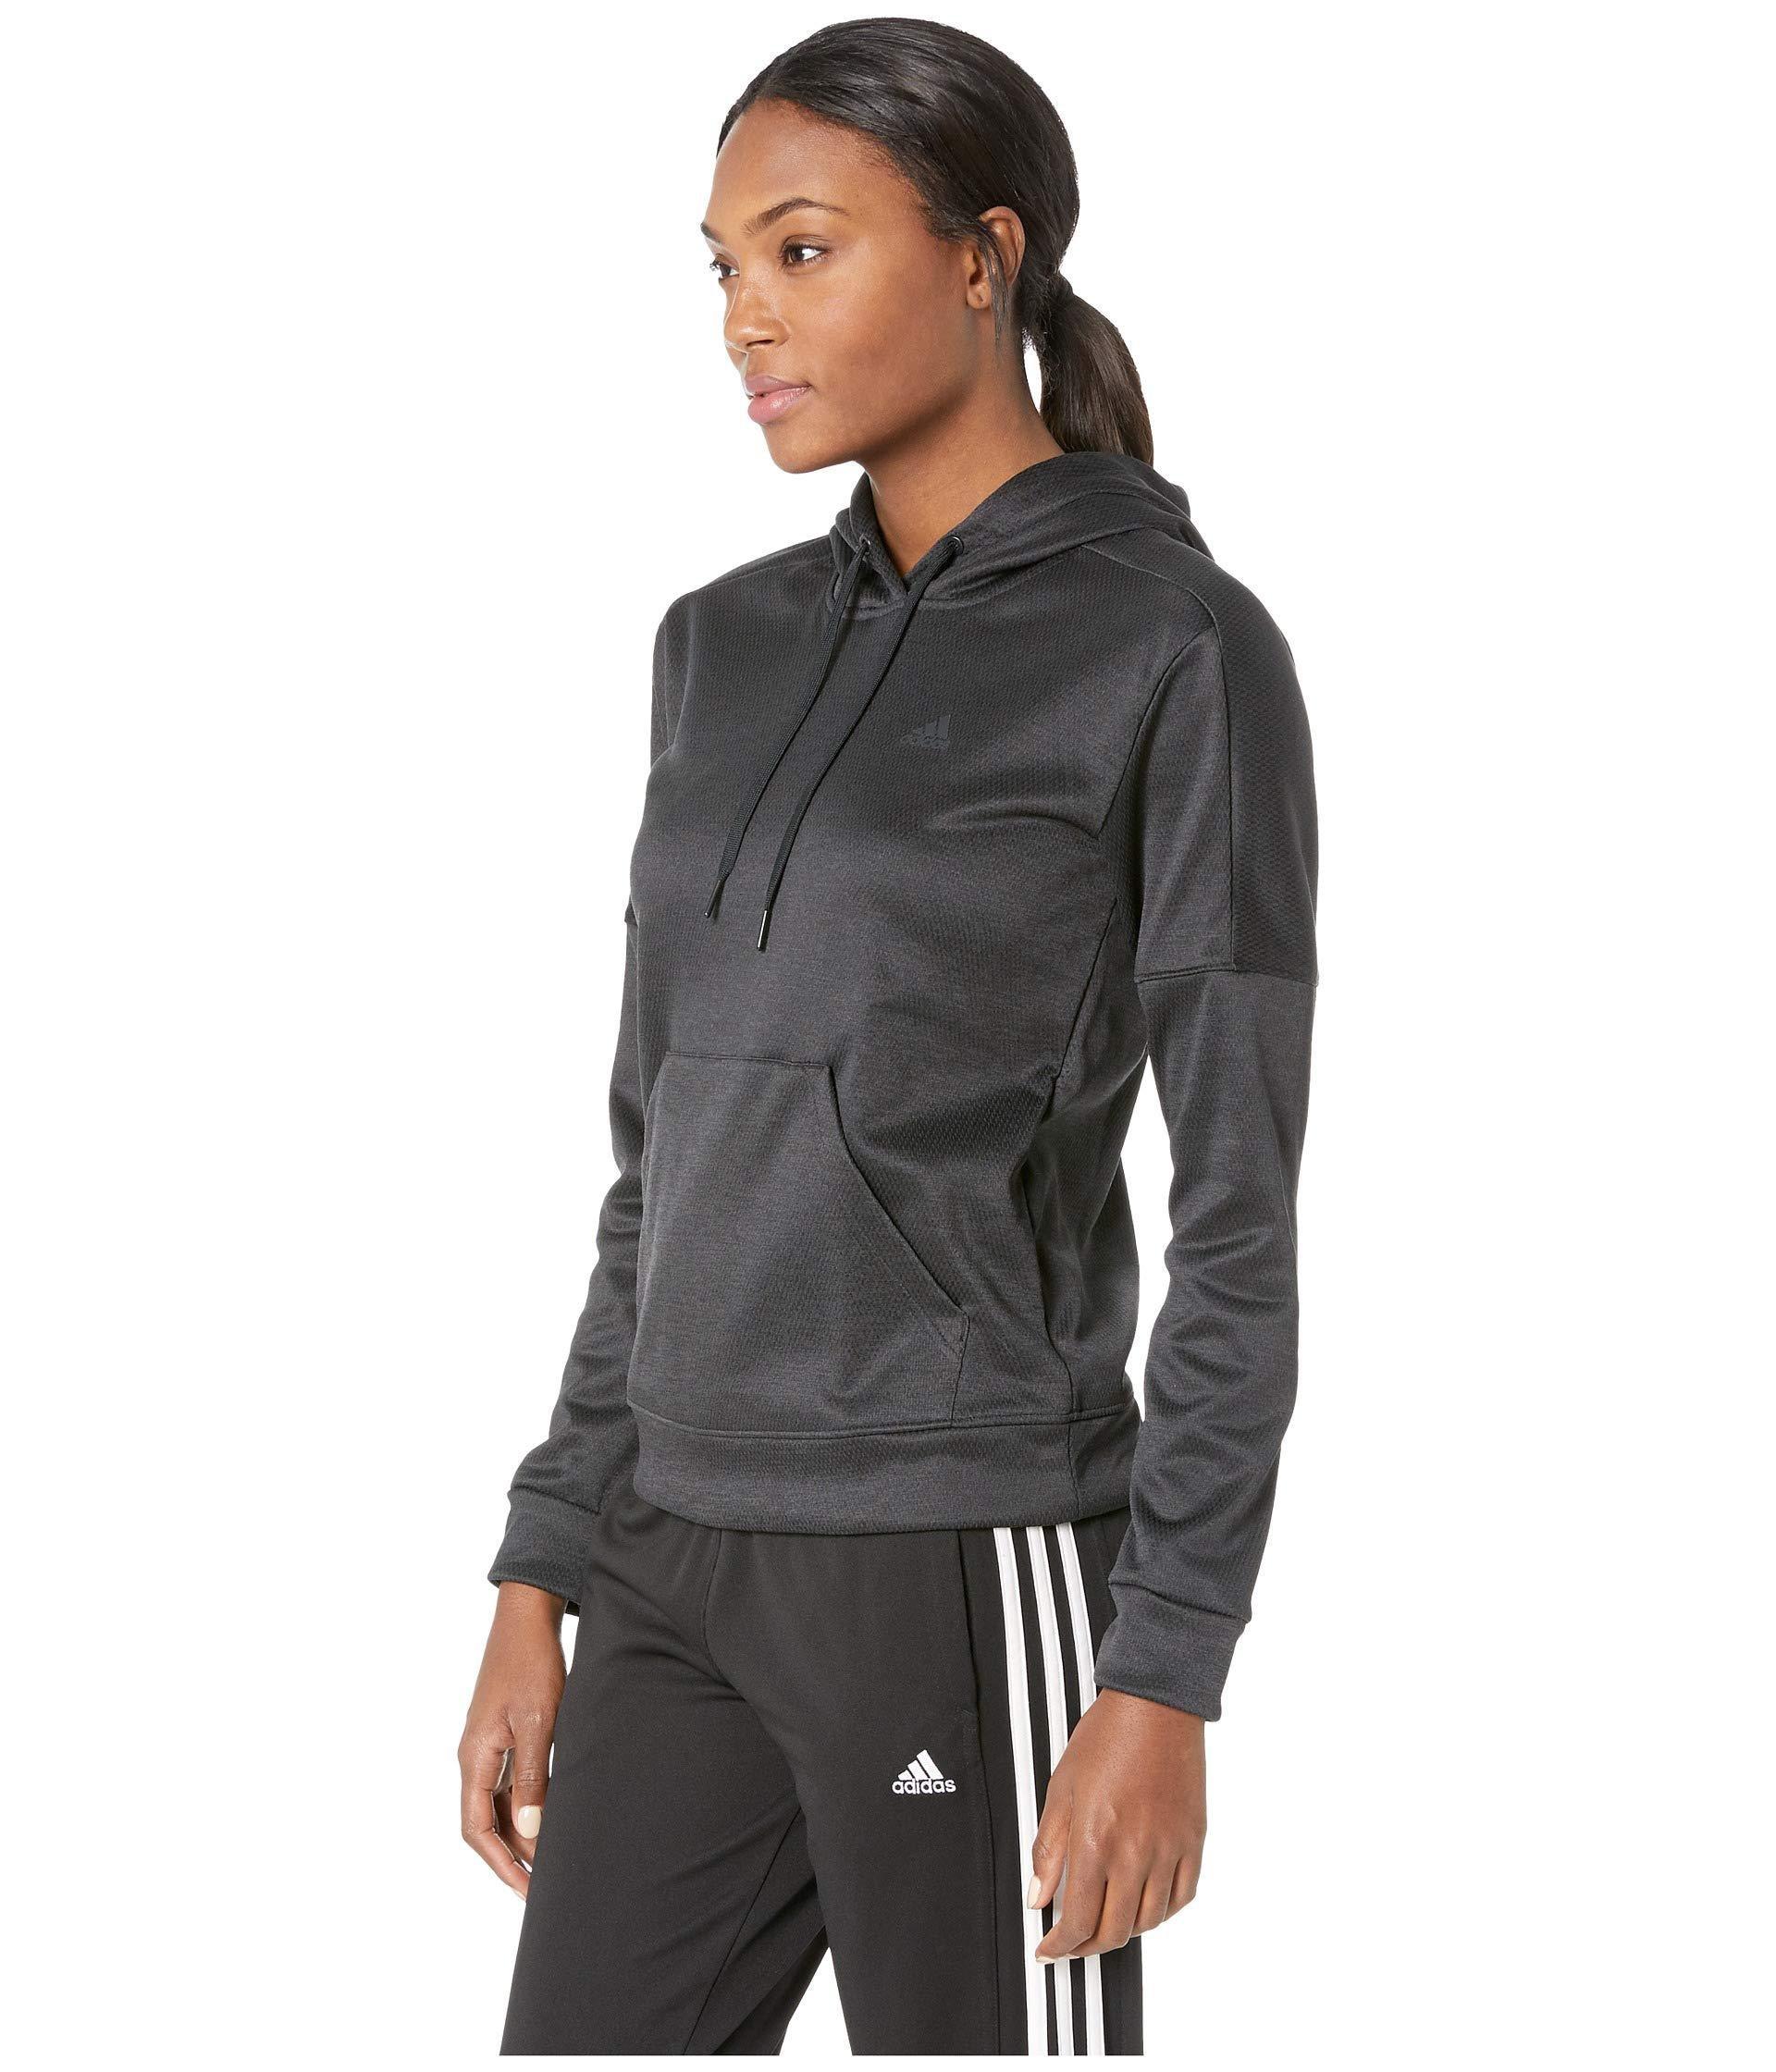 a5af99209da4 Lyst - adidas Team Issue Pullover Hoodie (black black carbon) Women s  Sweatshirt in Black